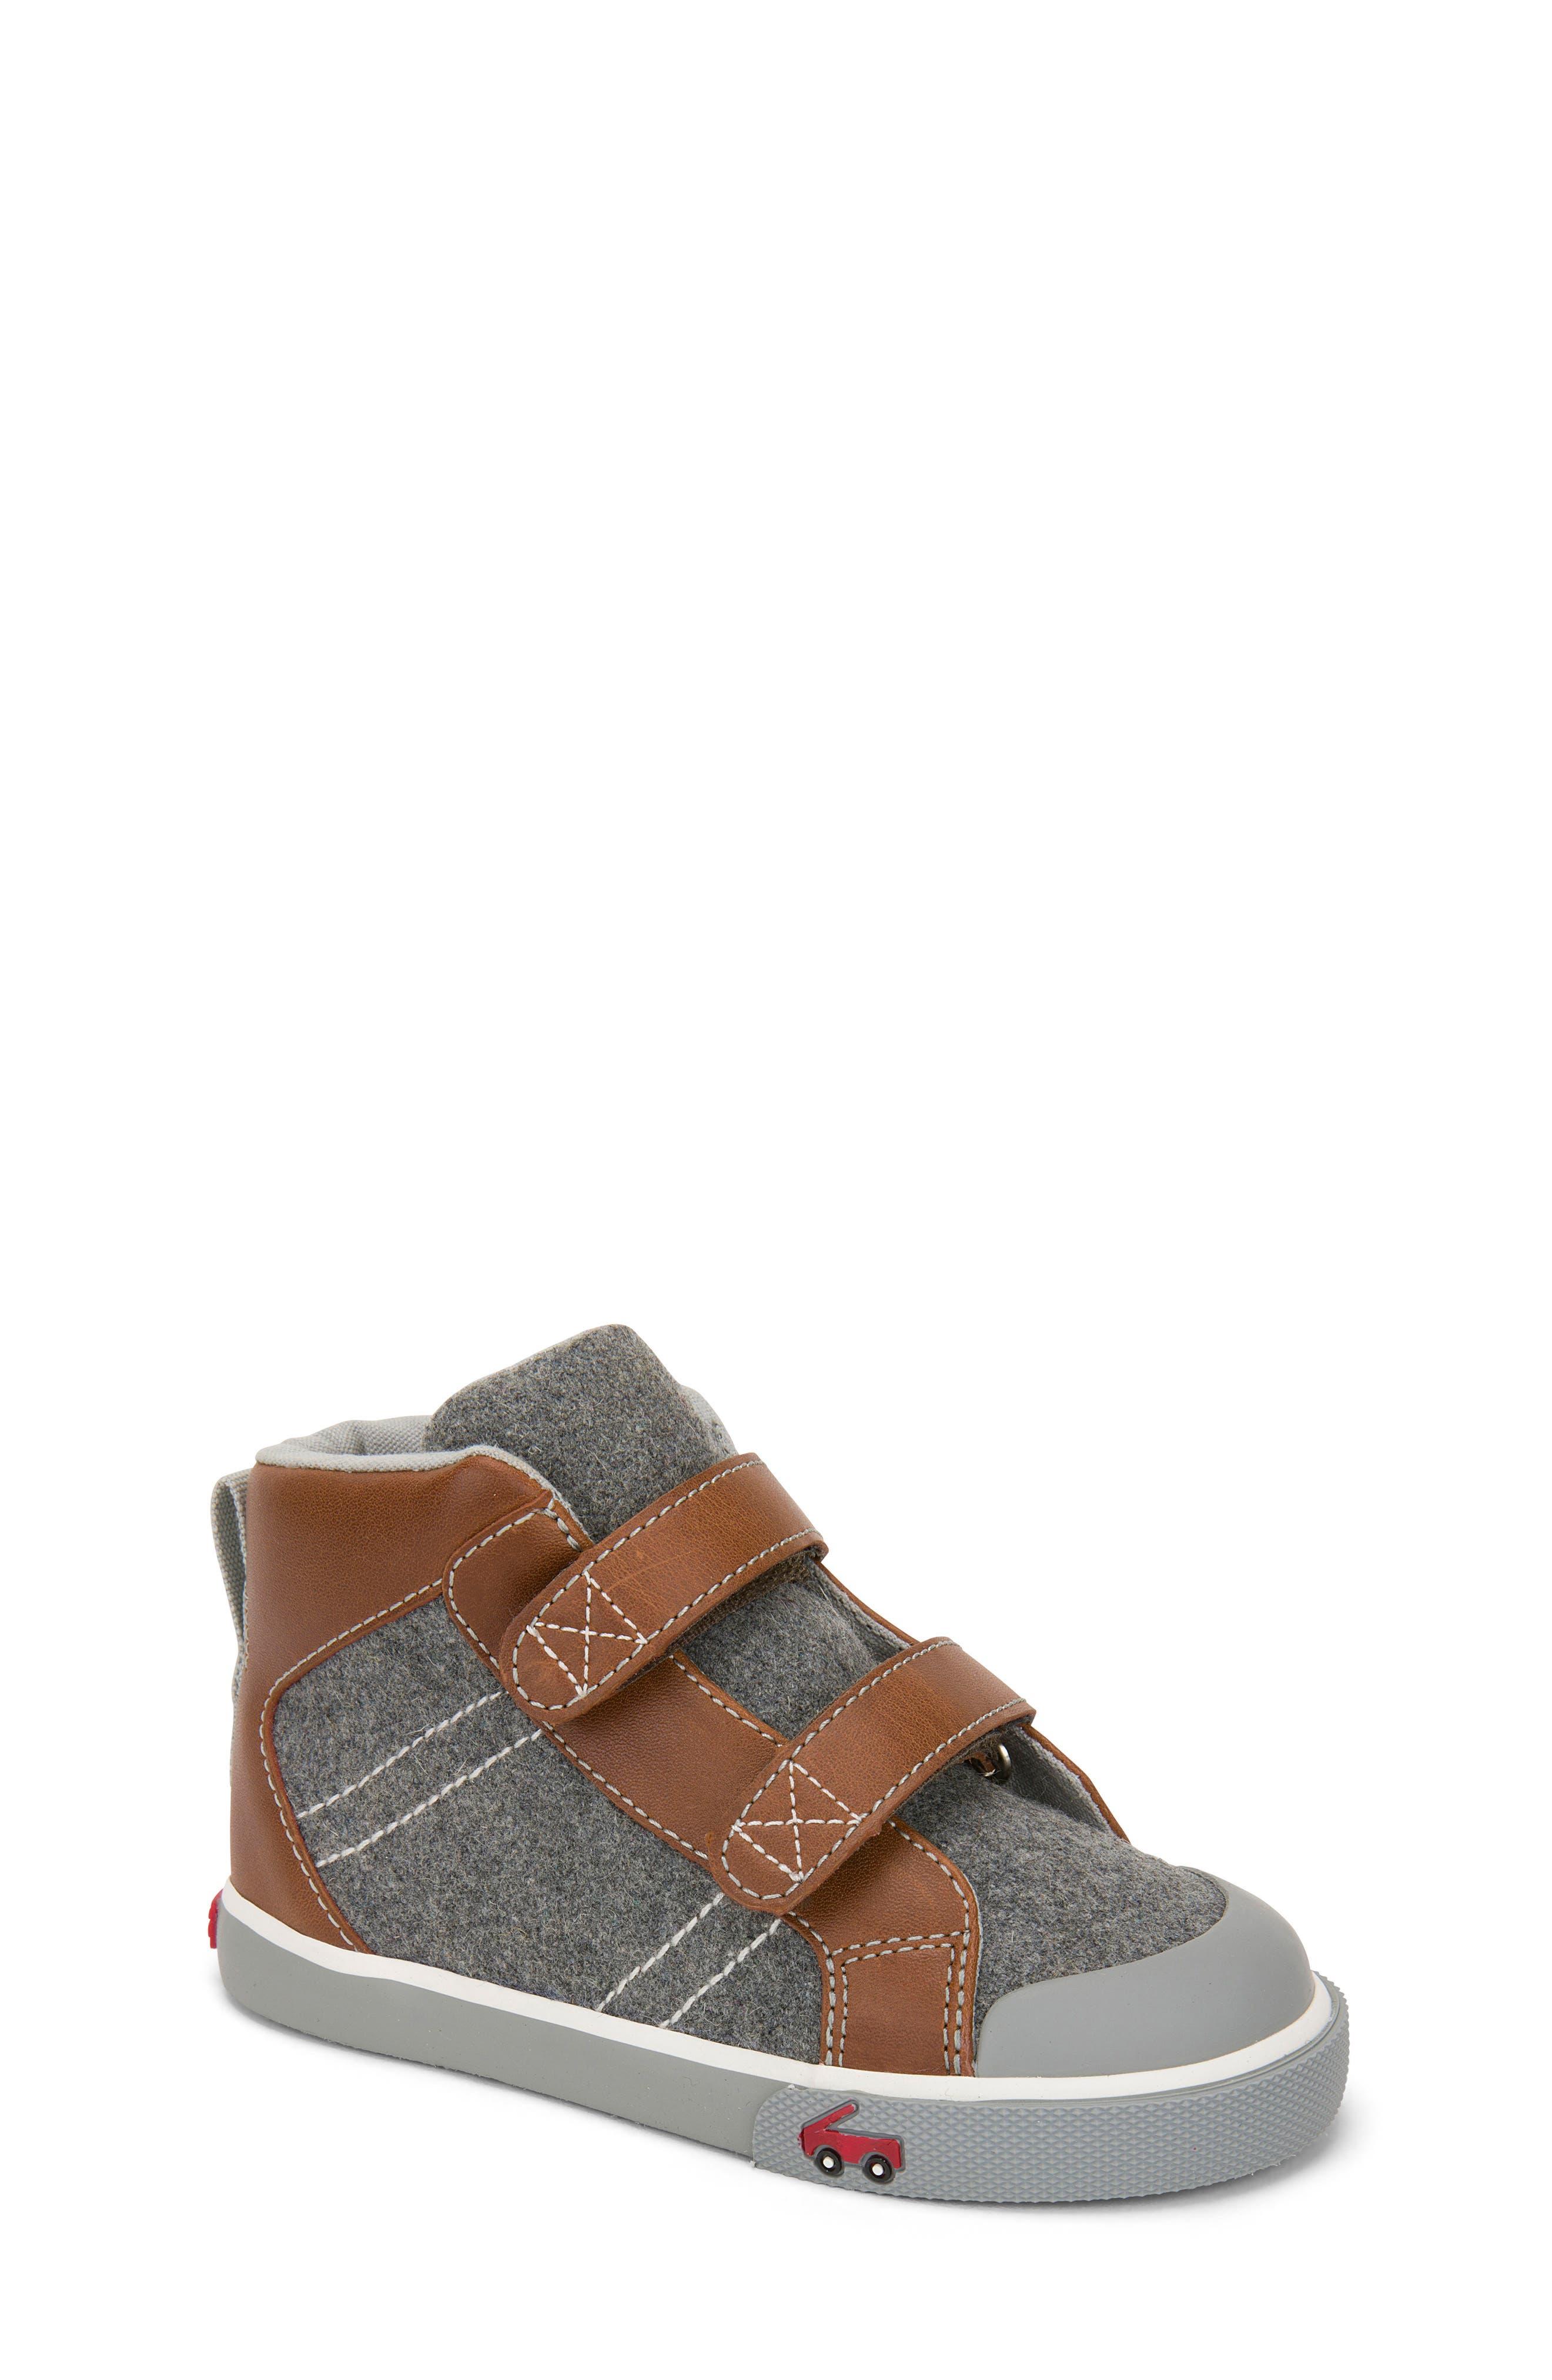 Matty Sneaker,                             Main thumbnail 1, color,                             Gray Felt